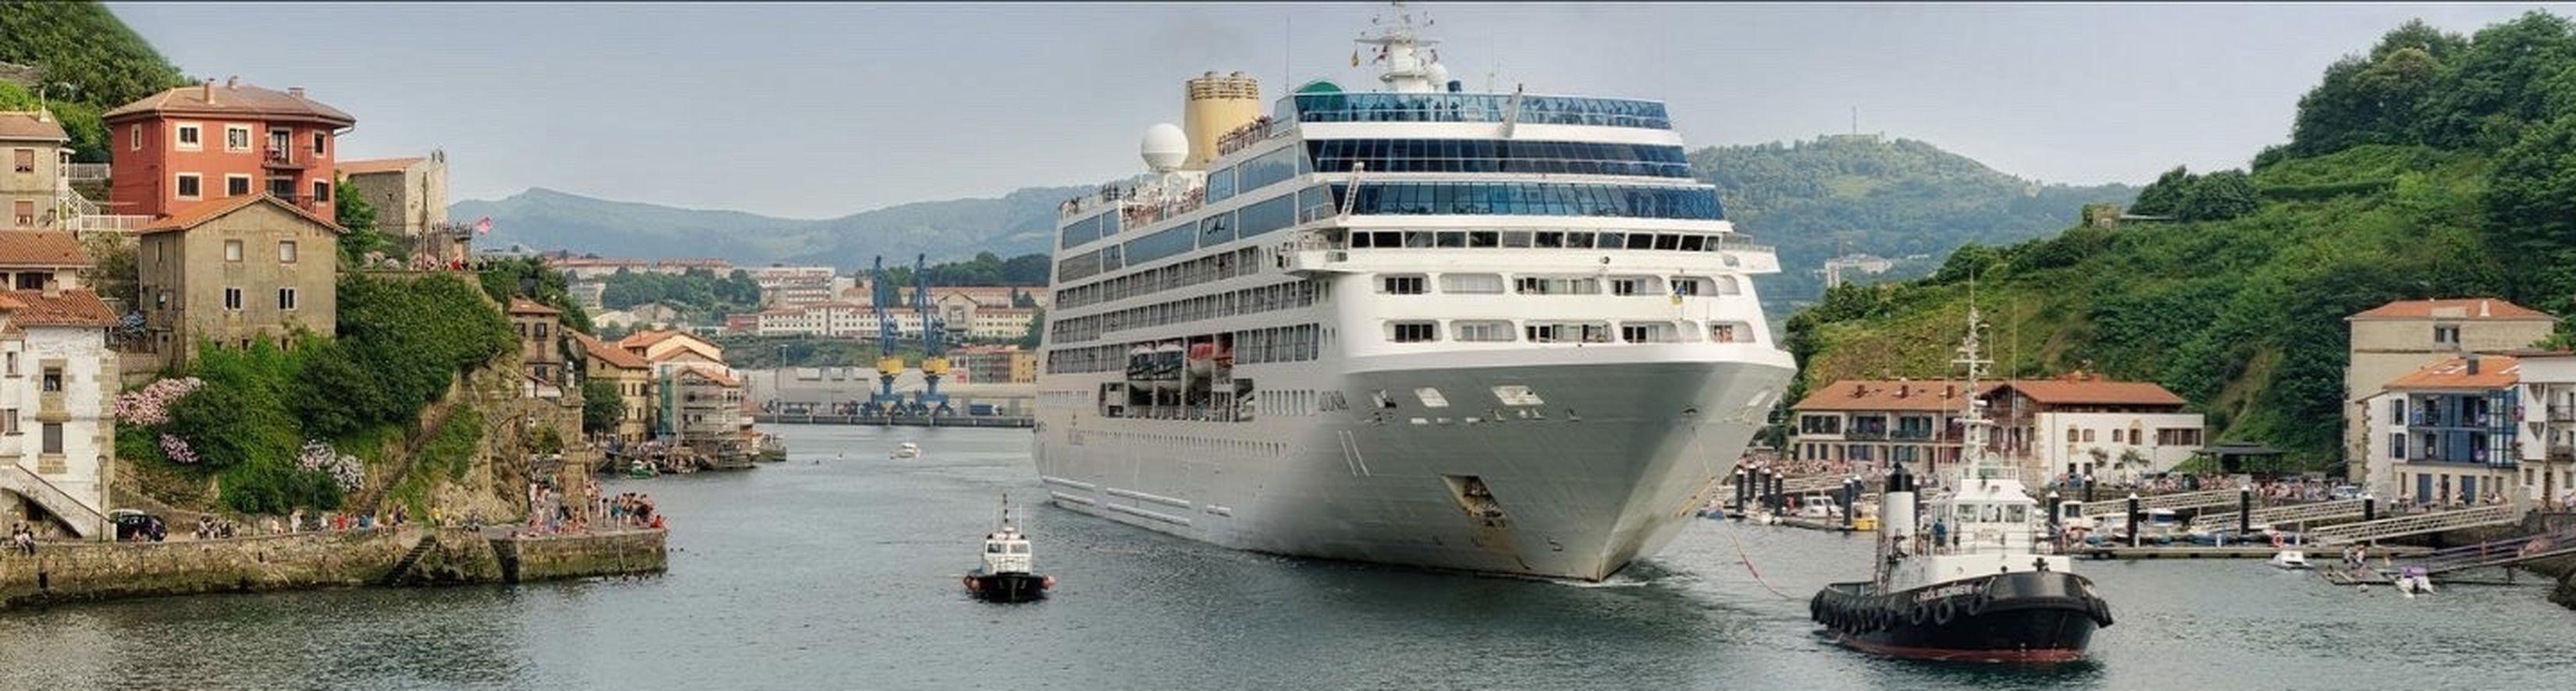 Transantlantic I Love My Country Bilbao Algorta Port North Of Spain BasqueCountry